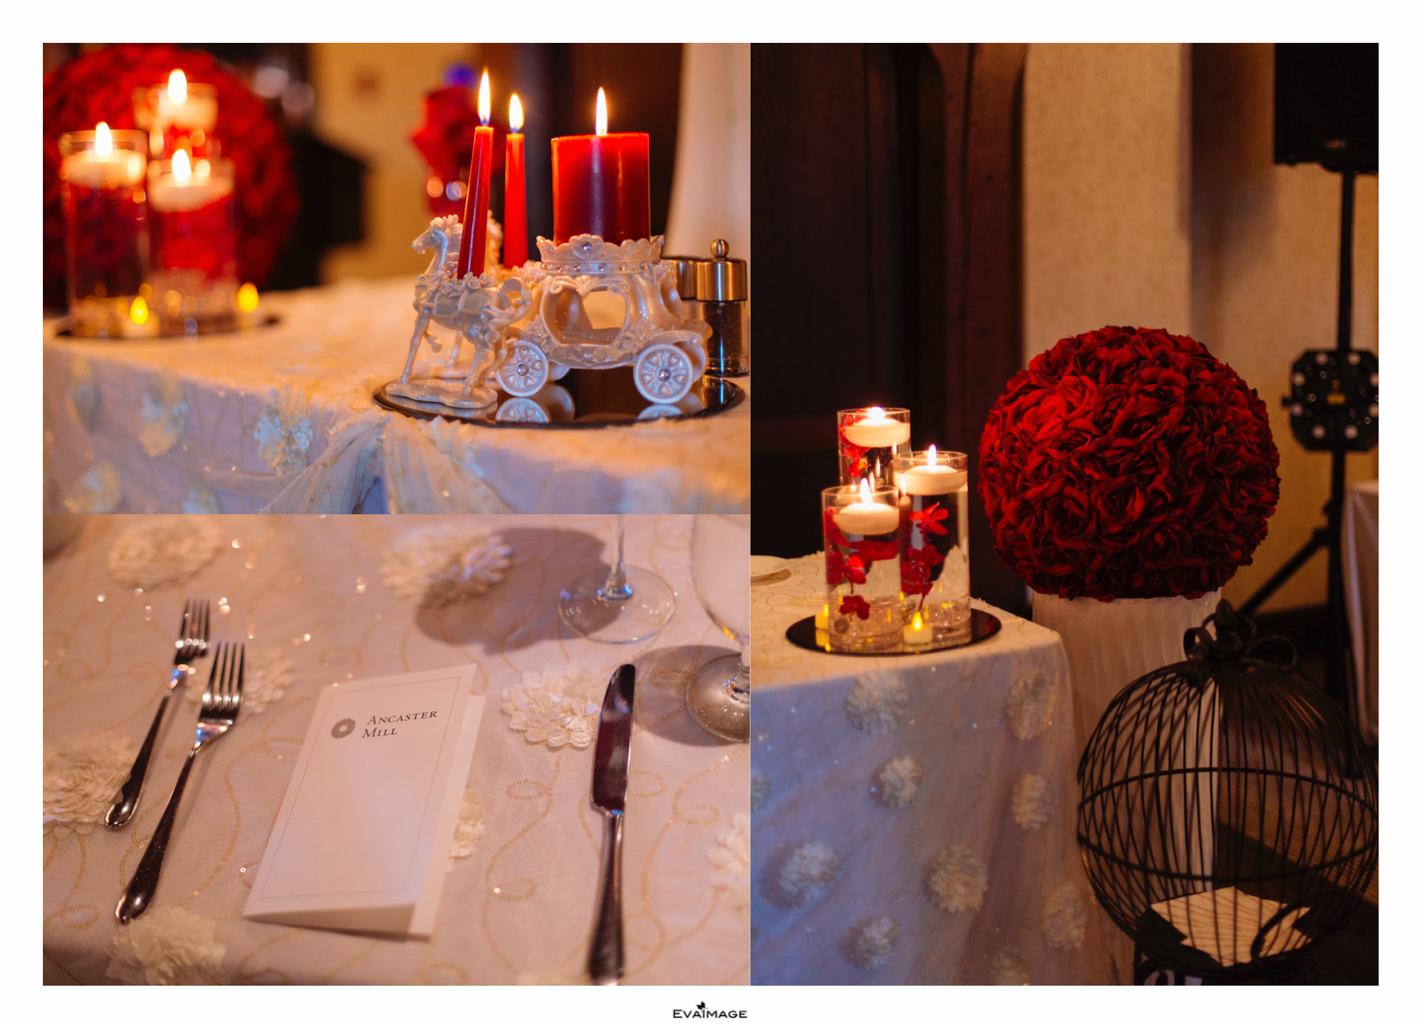 Ancaster_Mill_Wedding_Collage_EvaImage-4.jpg